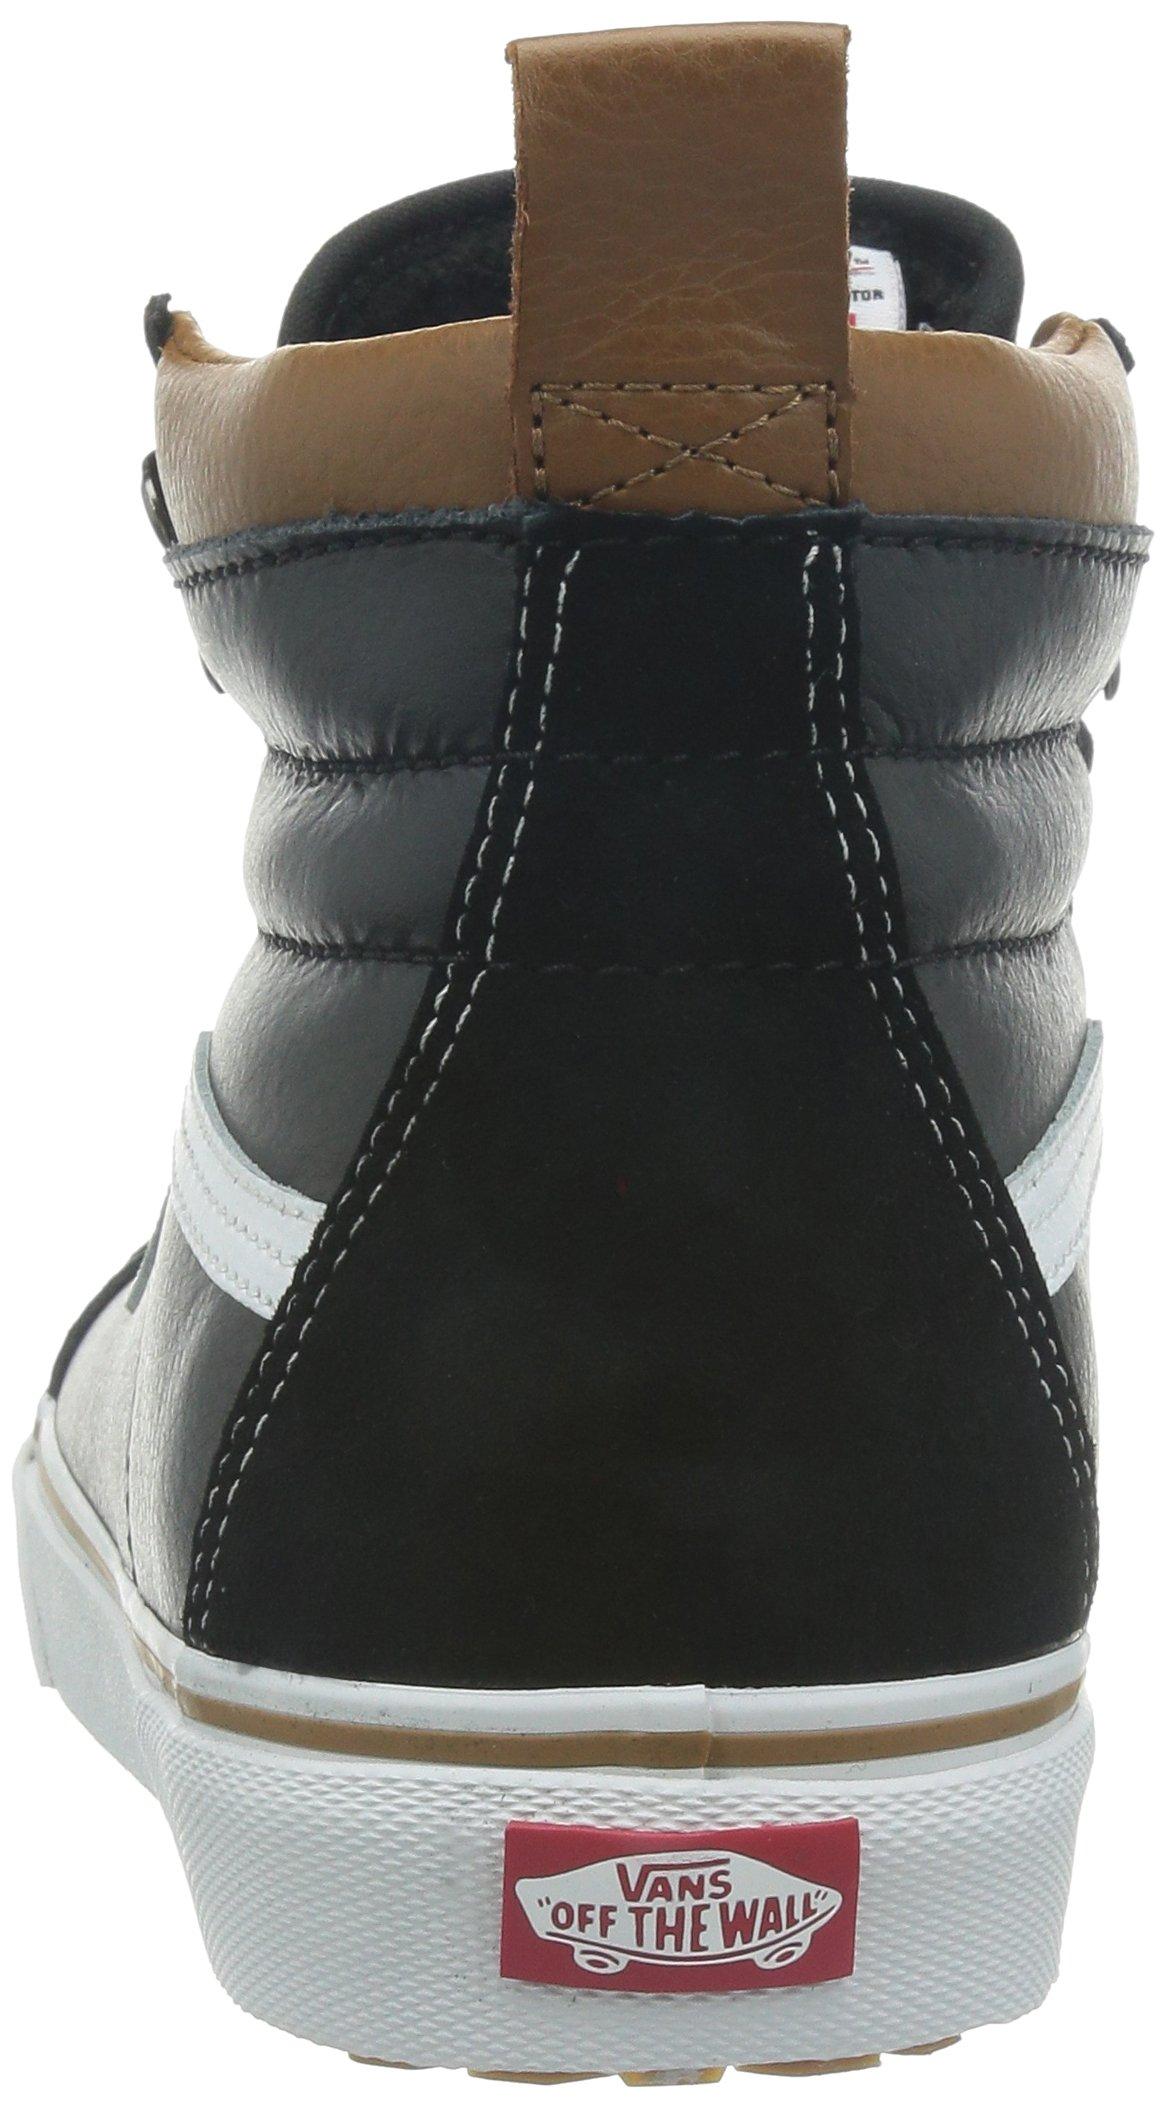 Vans Unisex Sk8-Hi MTE (MTE) Black/True White Skate Shoe 8.5 Men US/10 Women US by Vans (Image #2)